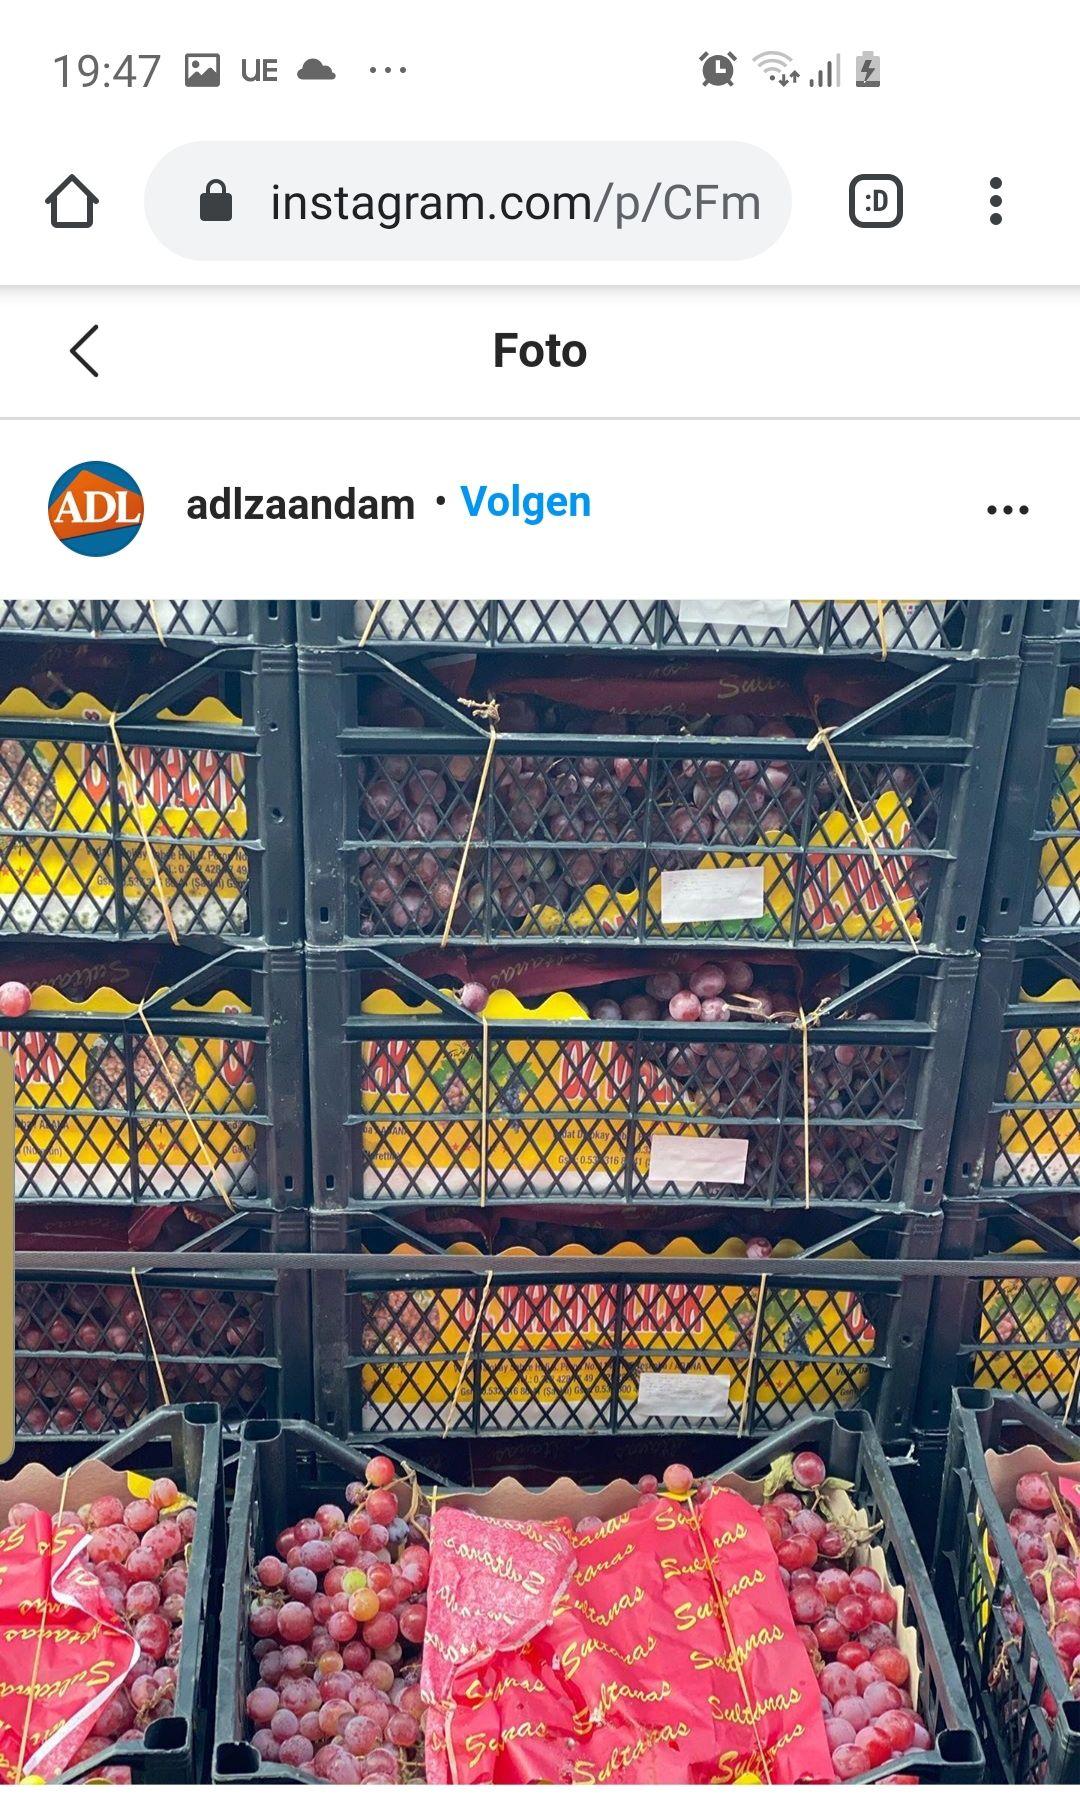 Lokaal Adl zaandam supermarkt 10 kilo druiven 1.99